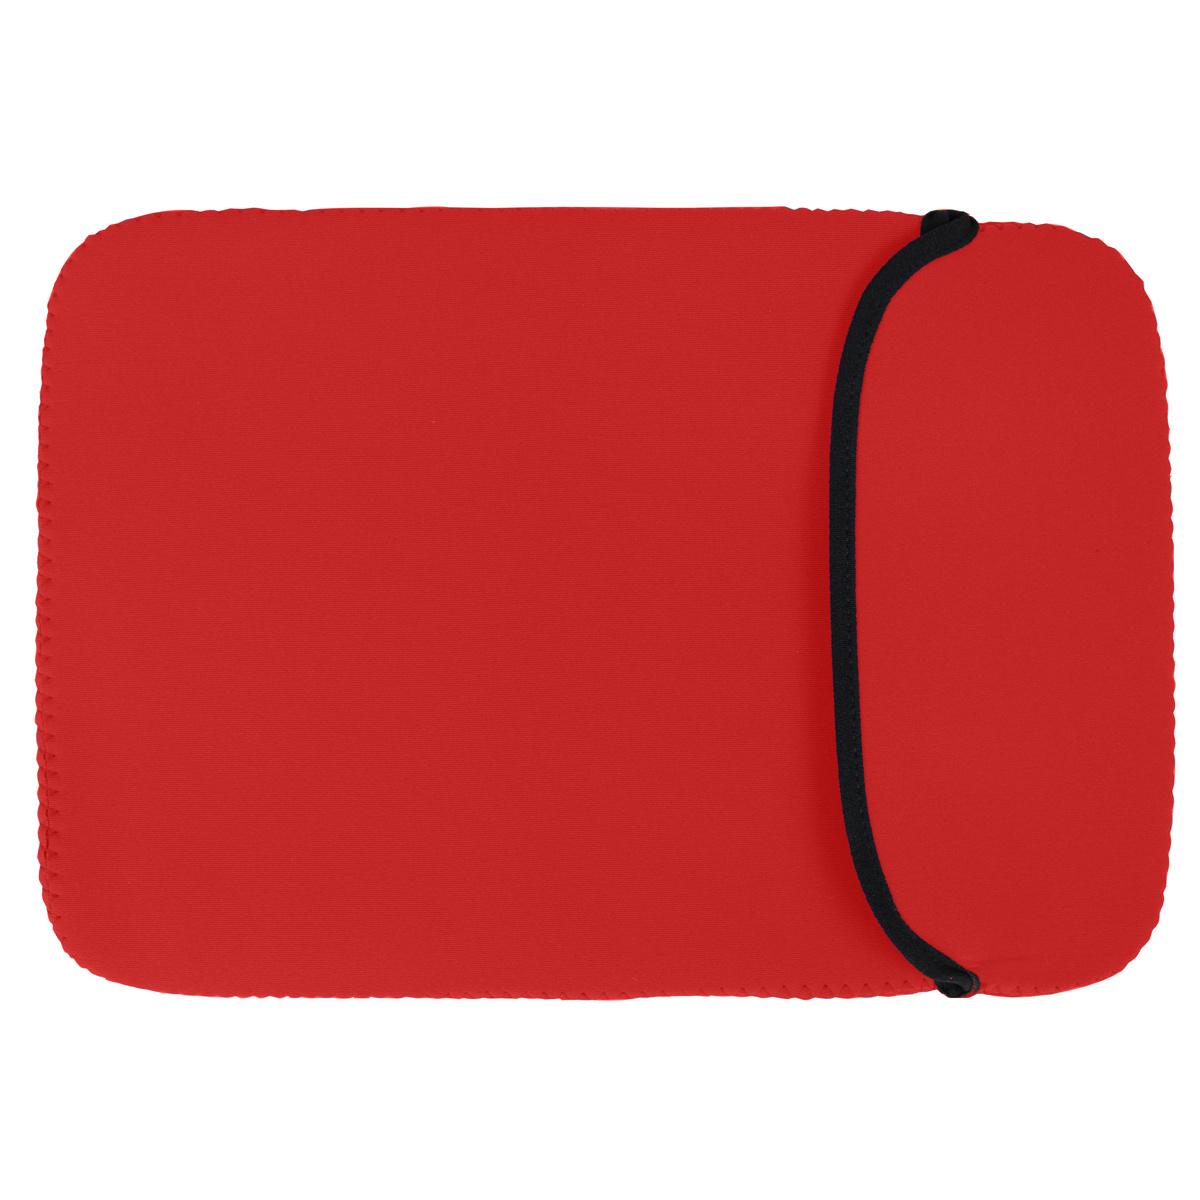 13 Inch Macbook Laptop Chromebook Neopreen sleeve case Rood